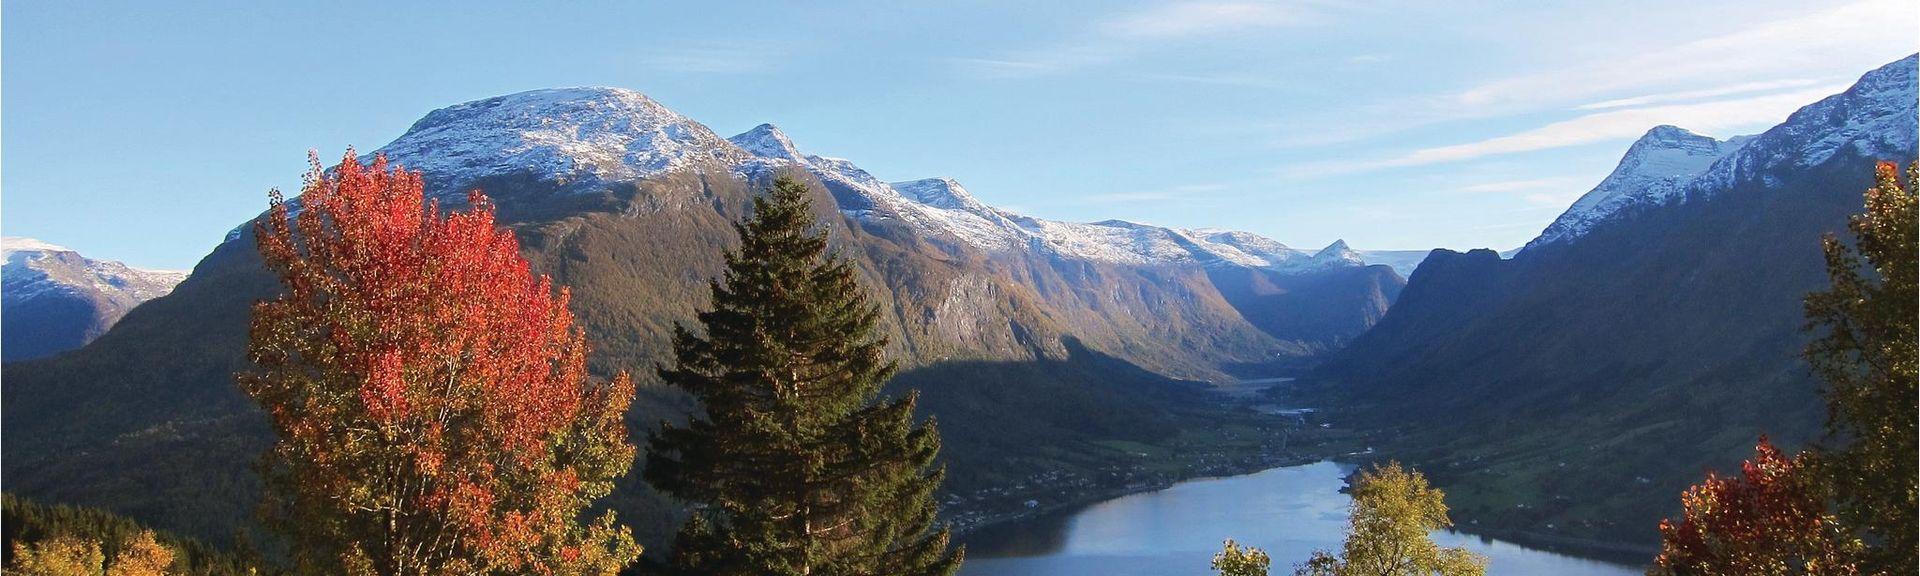 Olden, Stryn, Vestland, Norway